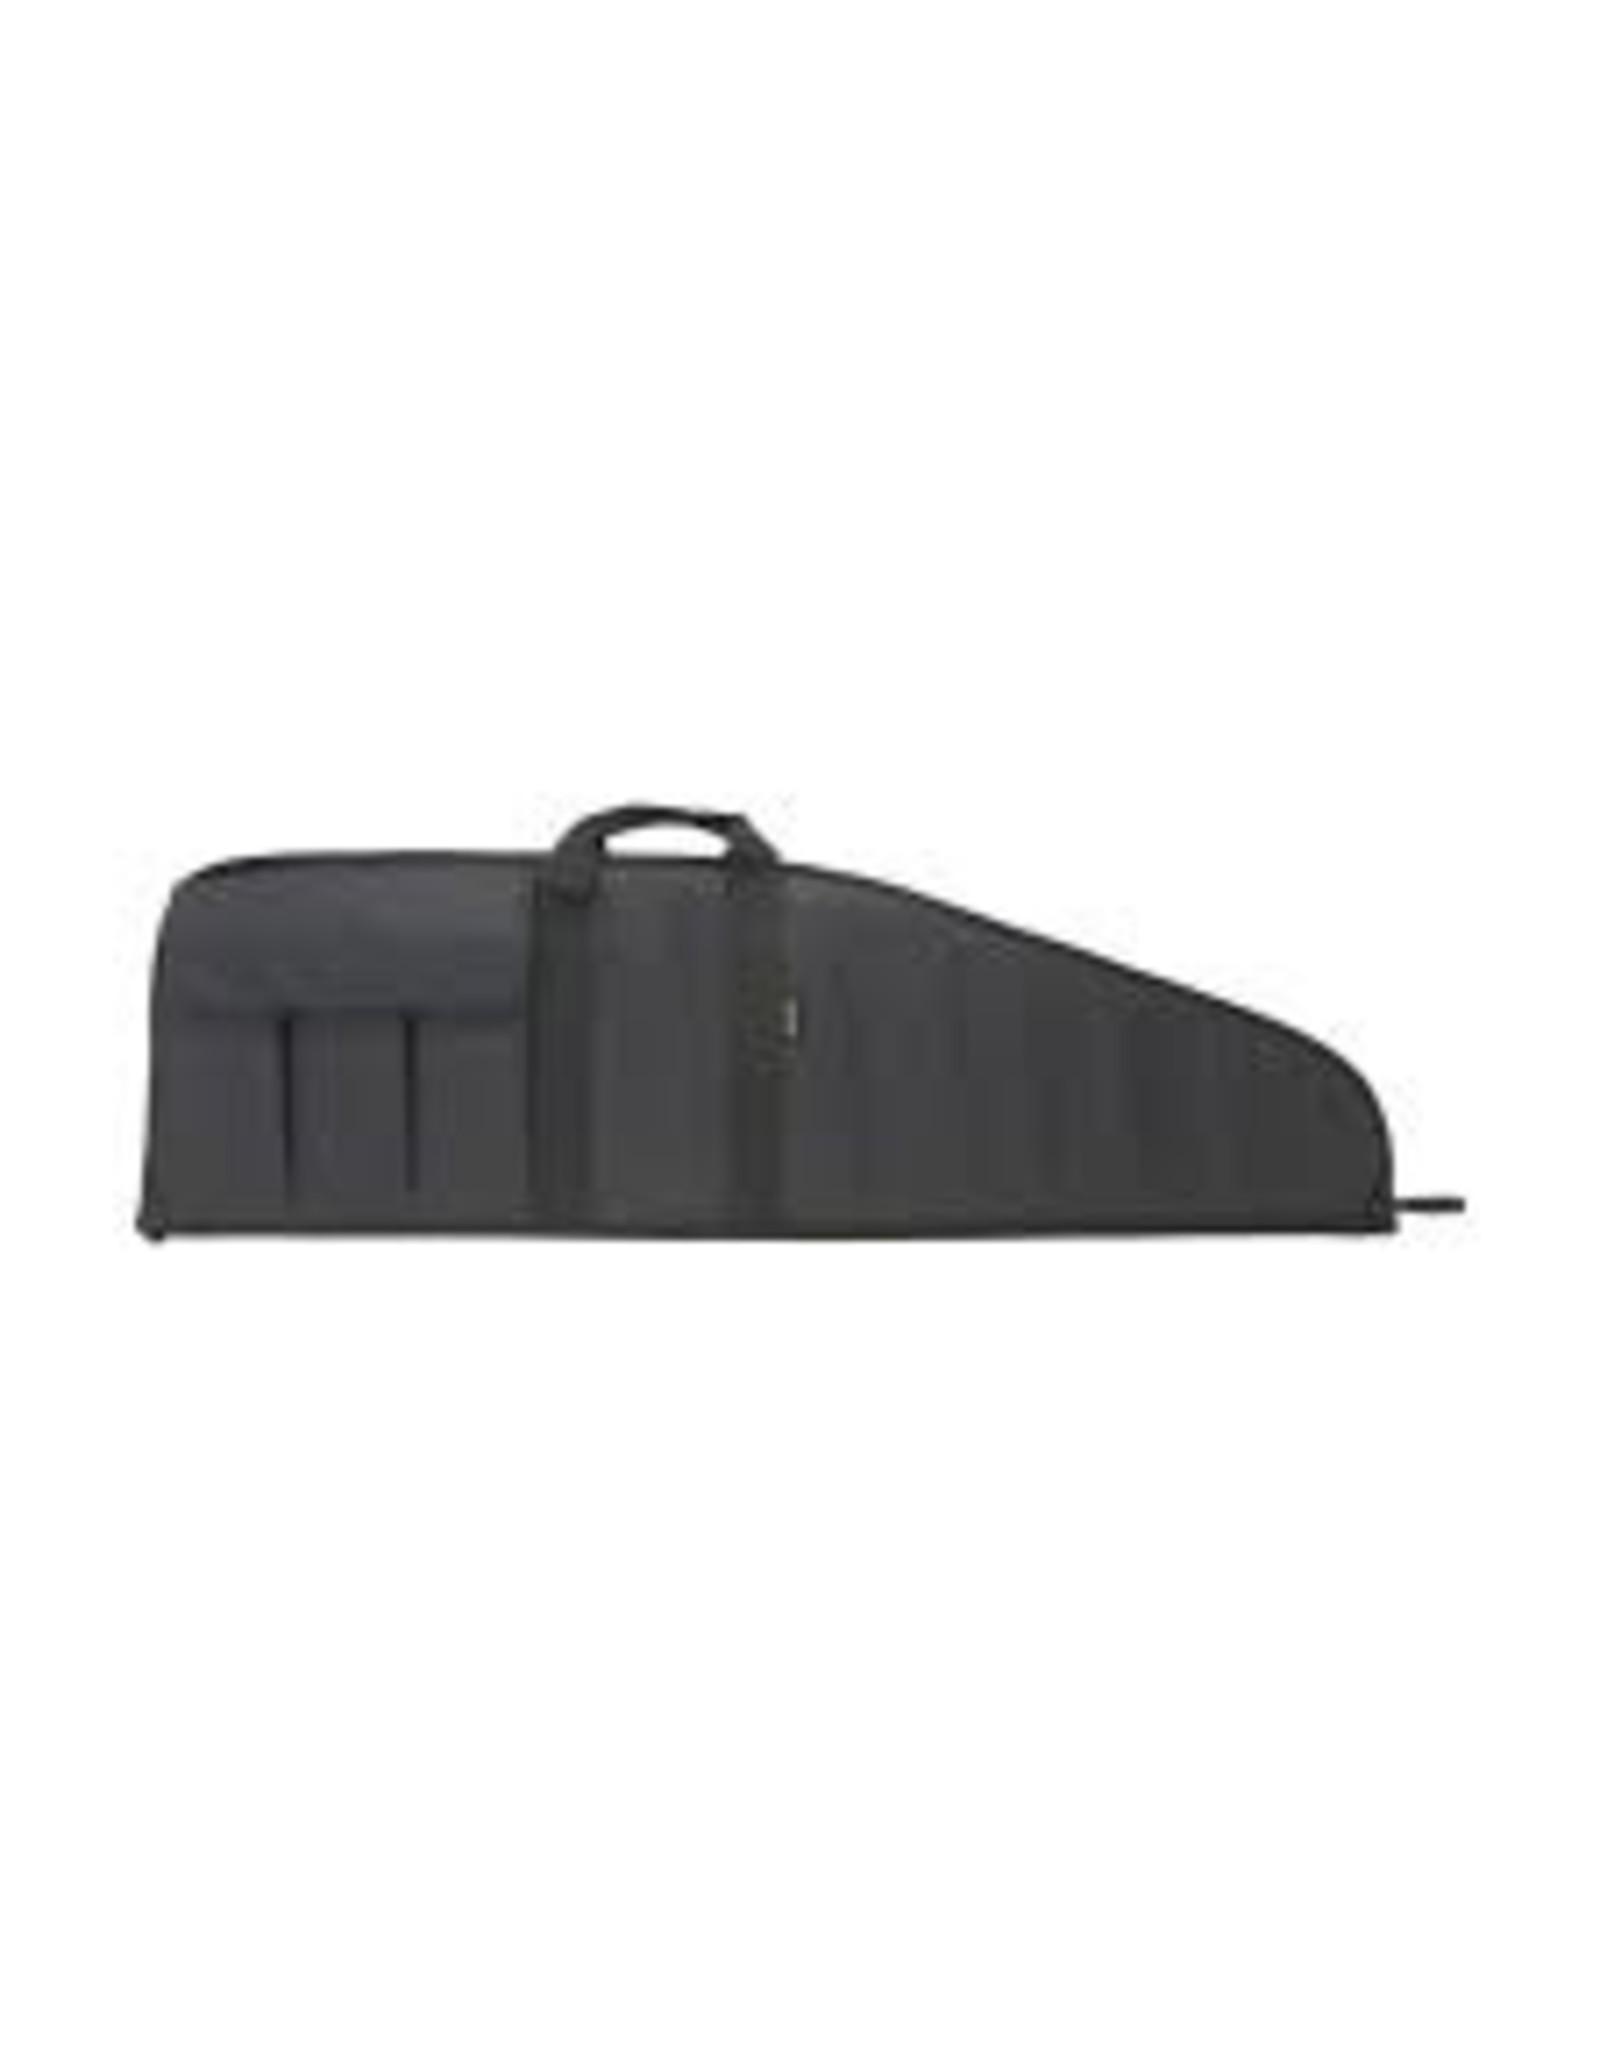 "Allen Allen Combat Tactical Rifle Case 42"" 4 Magazine"